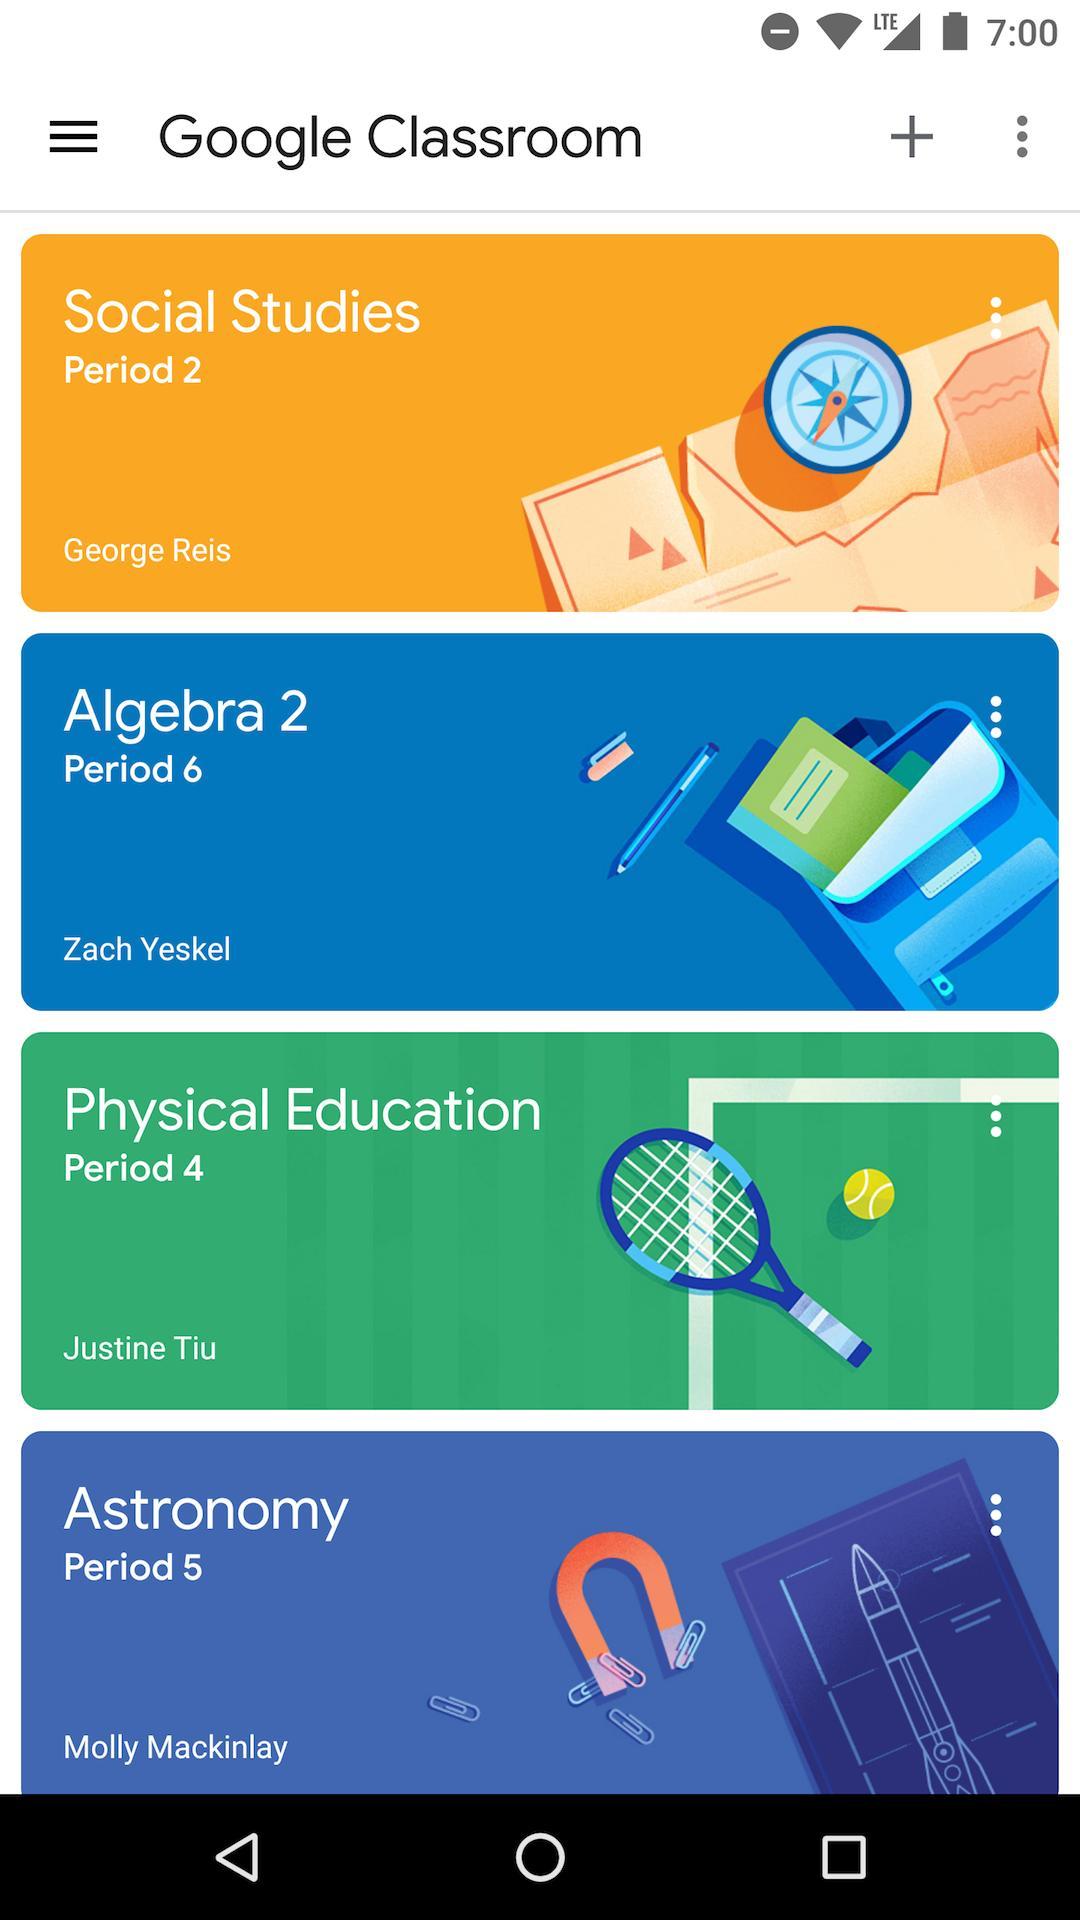 Google Classroom Reviews 2019: Details, Pricing ...  |Google Classroom